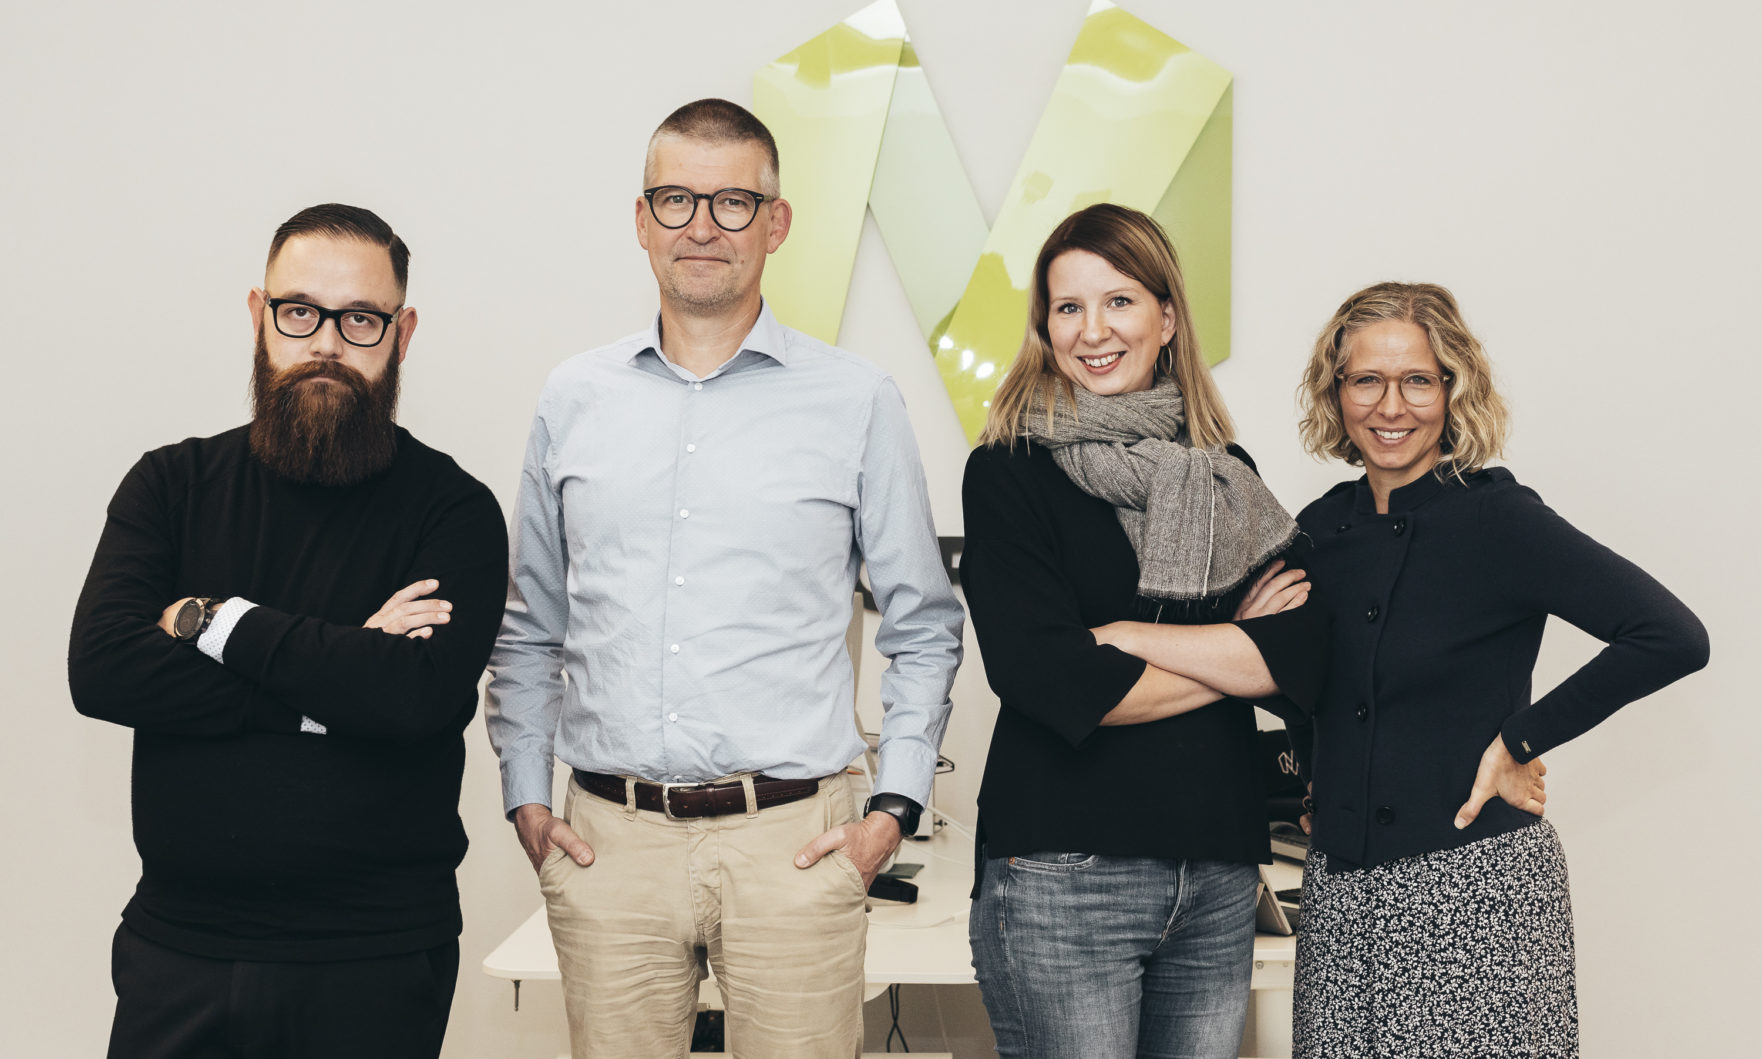 Aki Karlsson, Lars Rosenblad, Anni Kiviniemi, Anna Söderlund